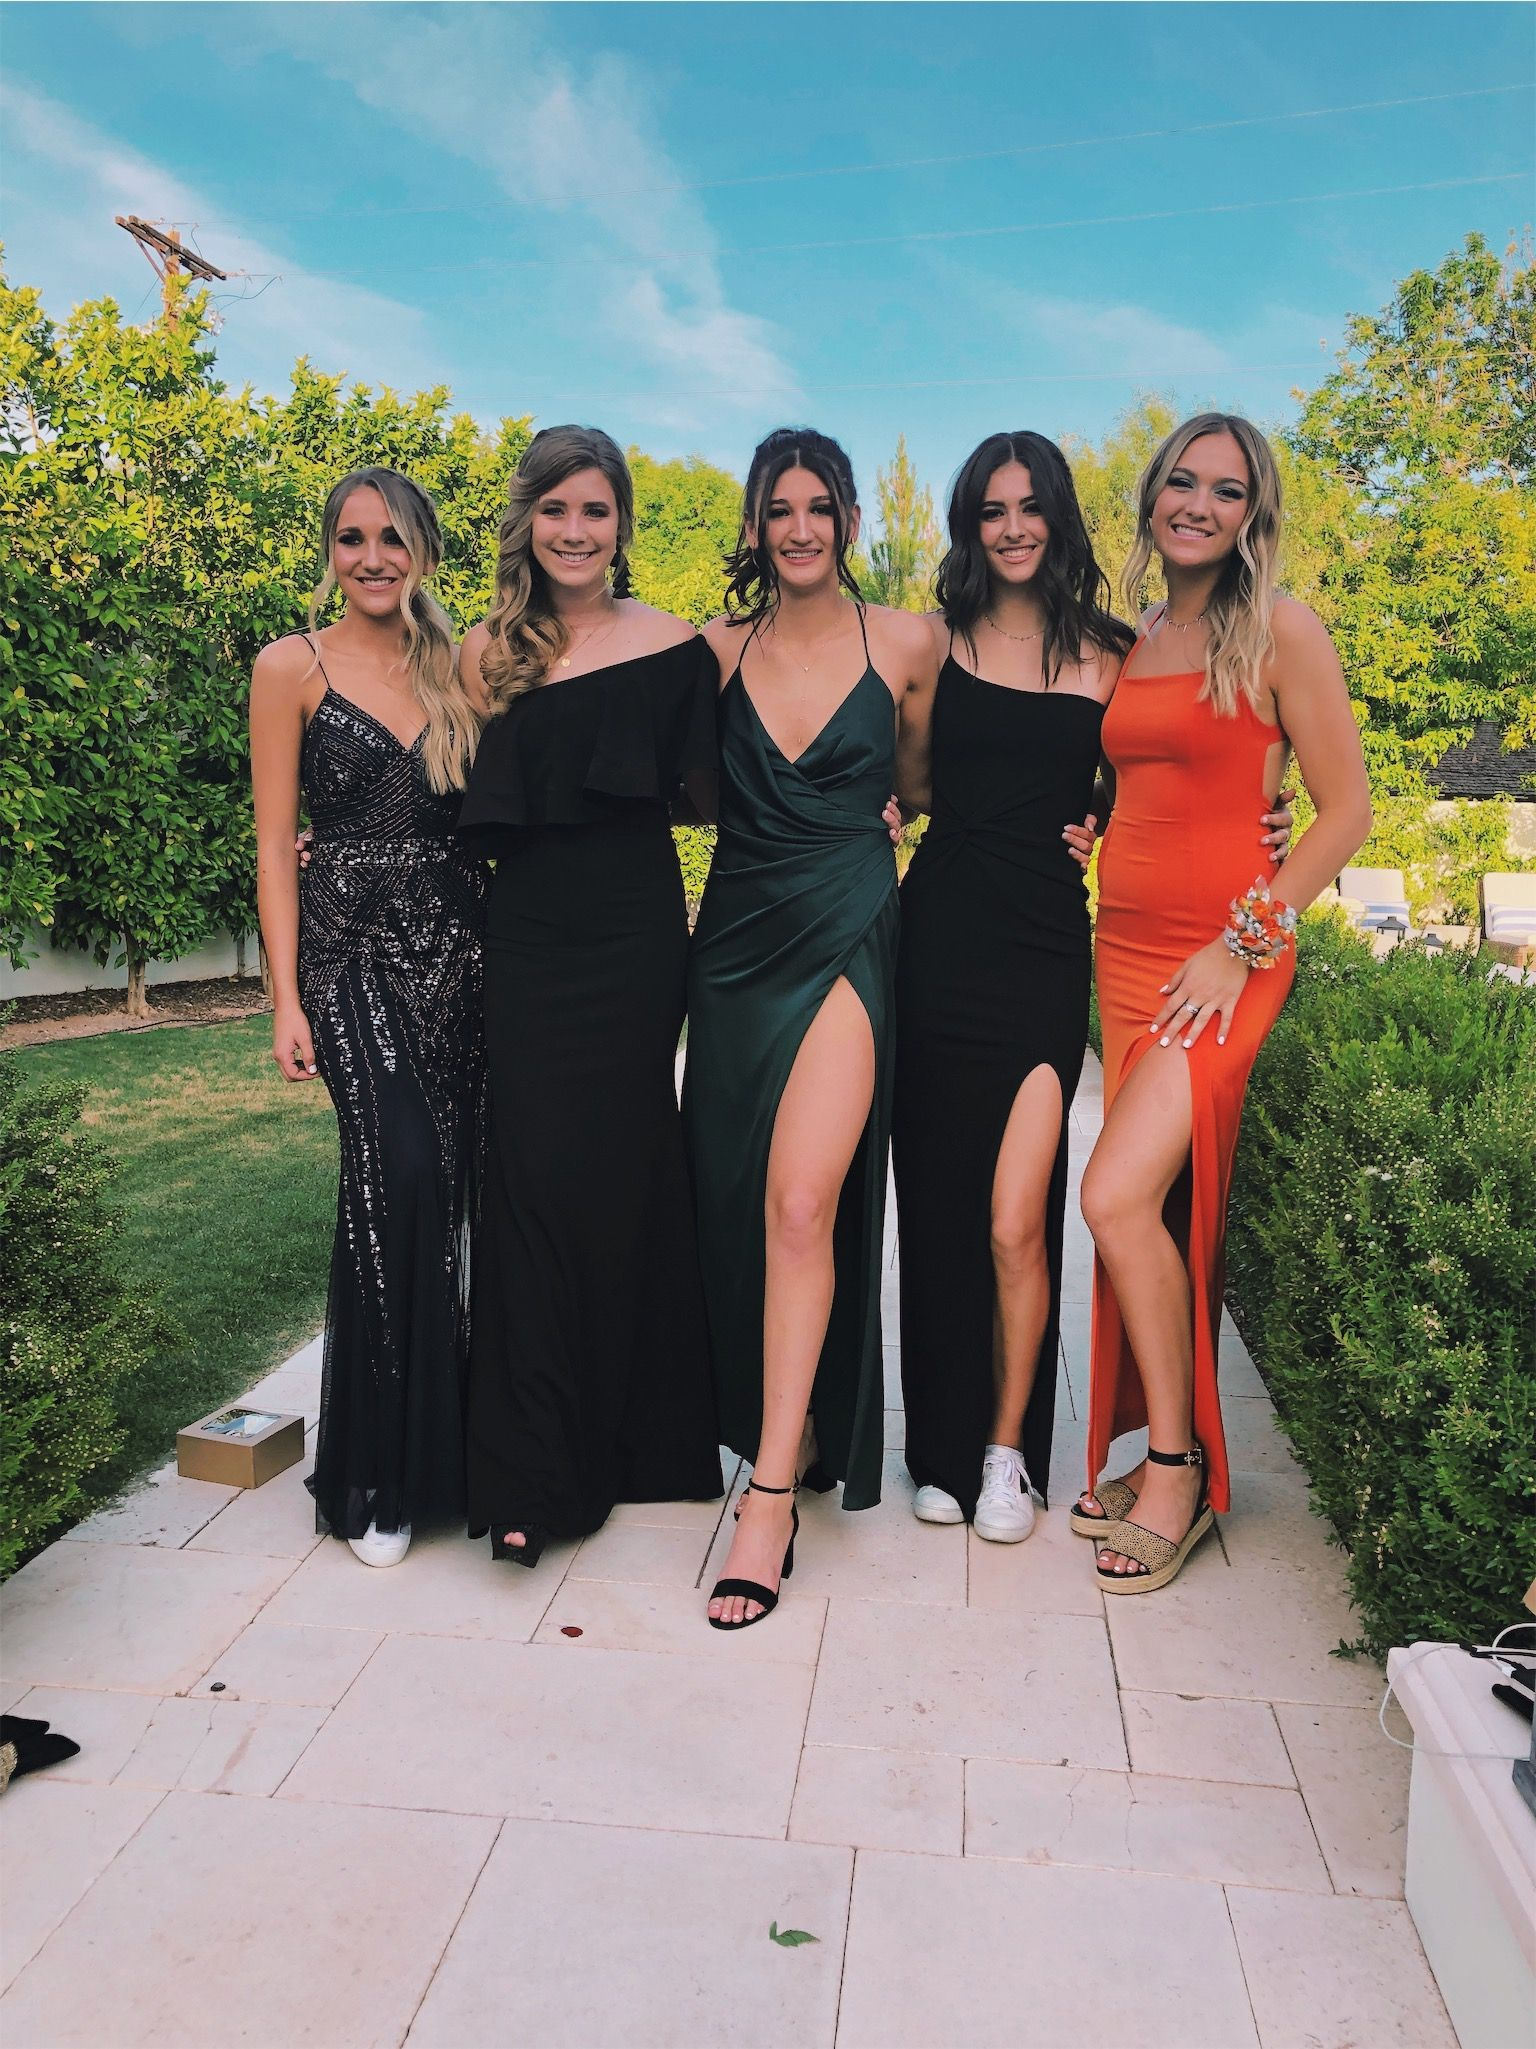 Images Jordynpender Vsco Prom Poses Prom Photoshoot Prom Photos [ 2049 x 1536 Pixel ]